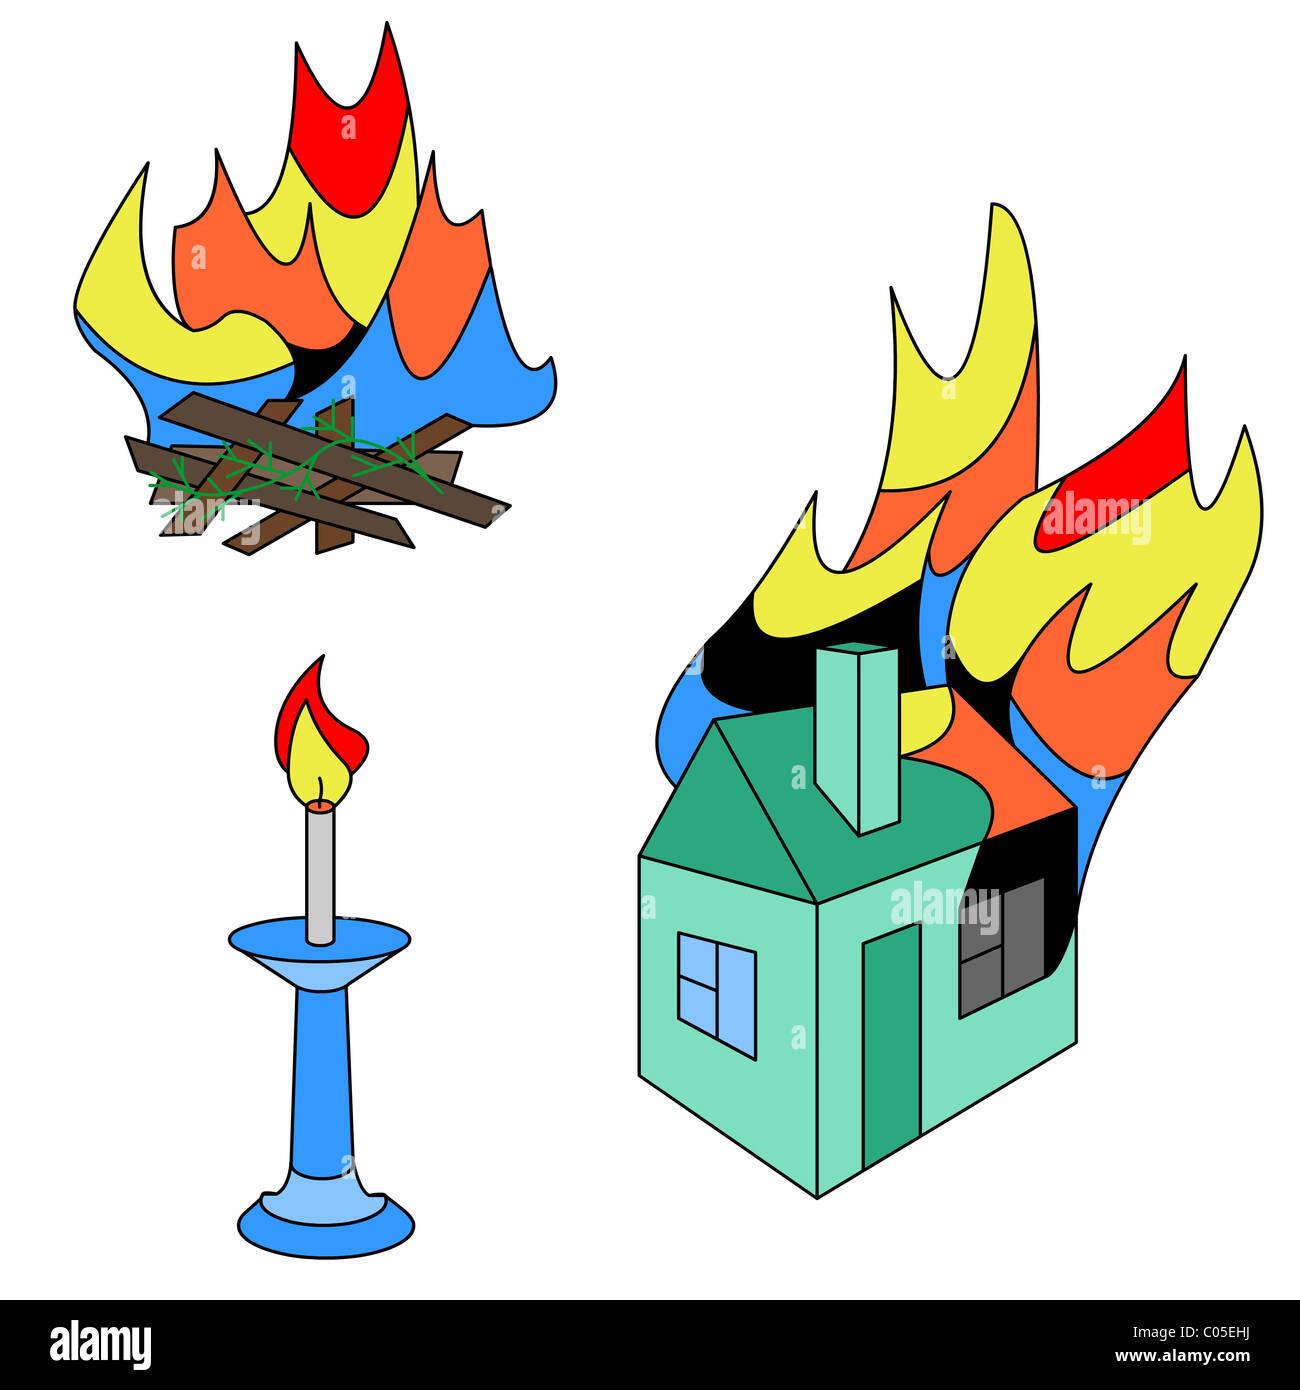 Fire burns, heats, shines, destroys - Stock Image